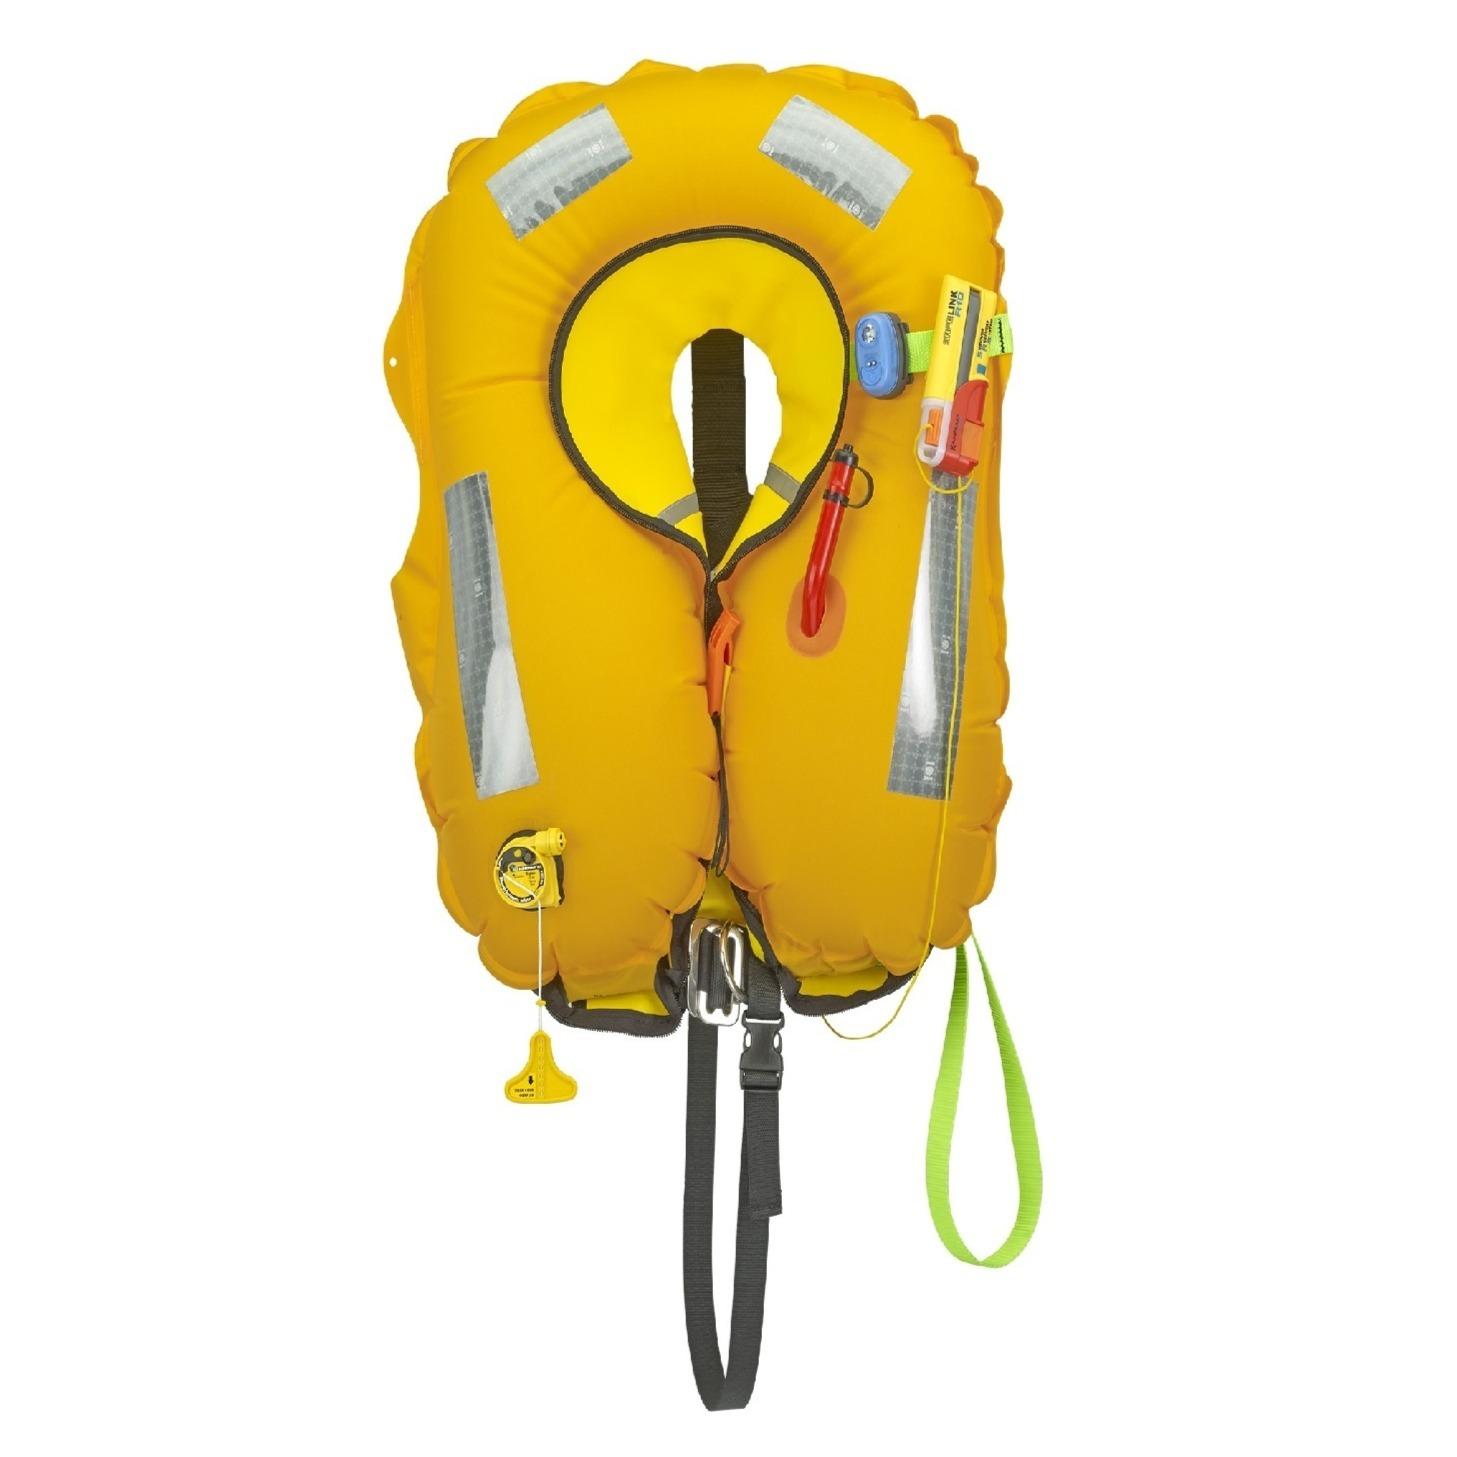 Pilot Pro 180 inflatable lifejacket